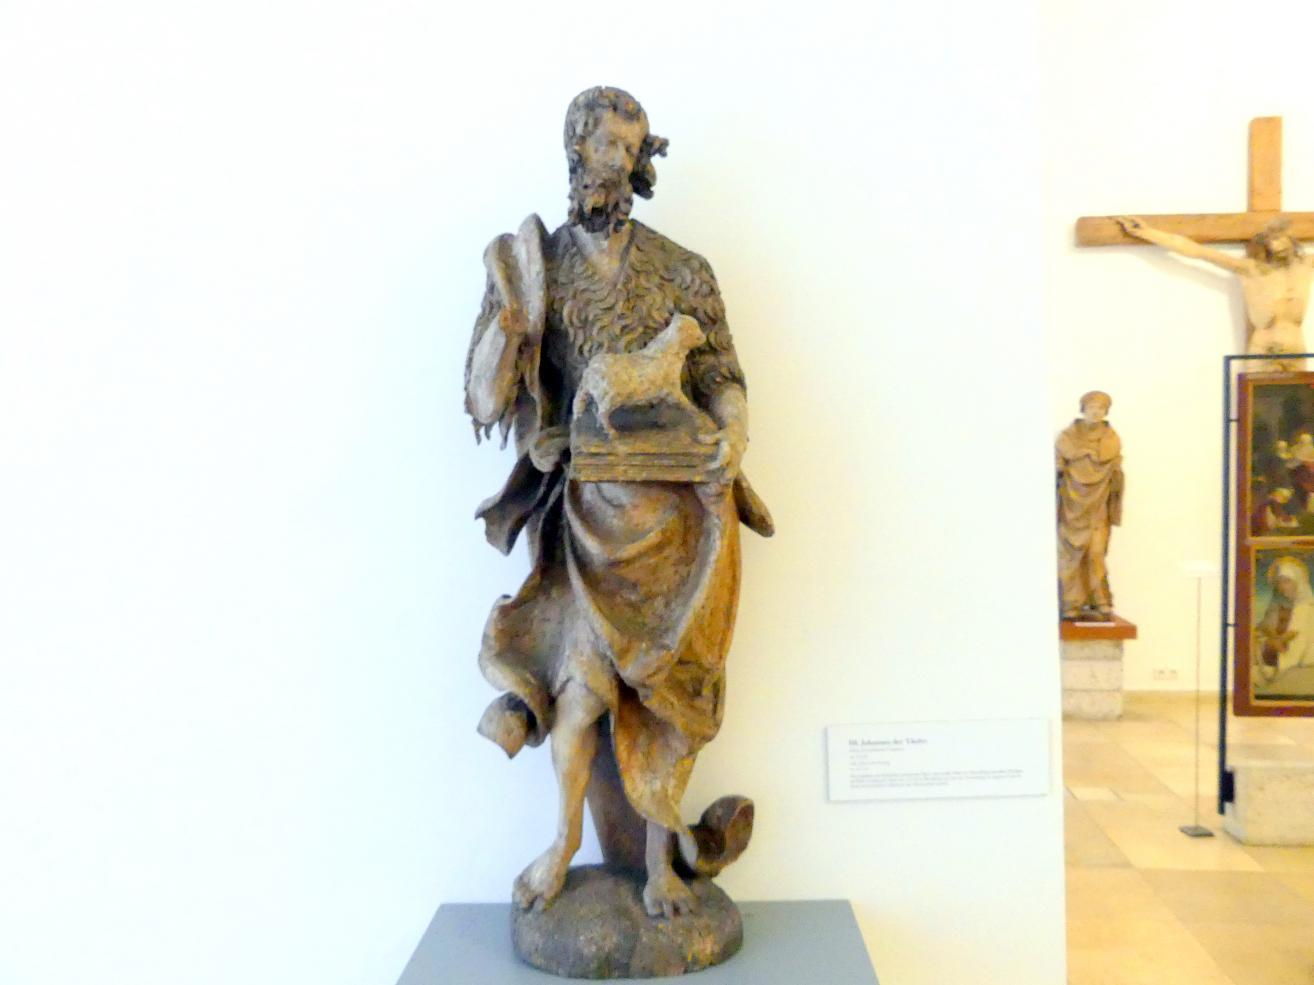 Hans Leinberger (Umkreis): Hl. Johannes der Täufer, Um 1515 - 1520